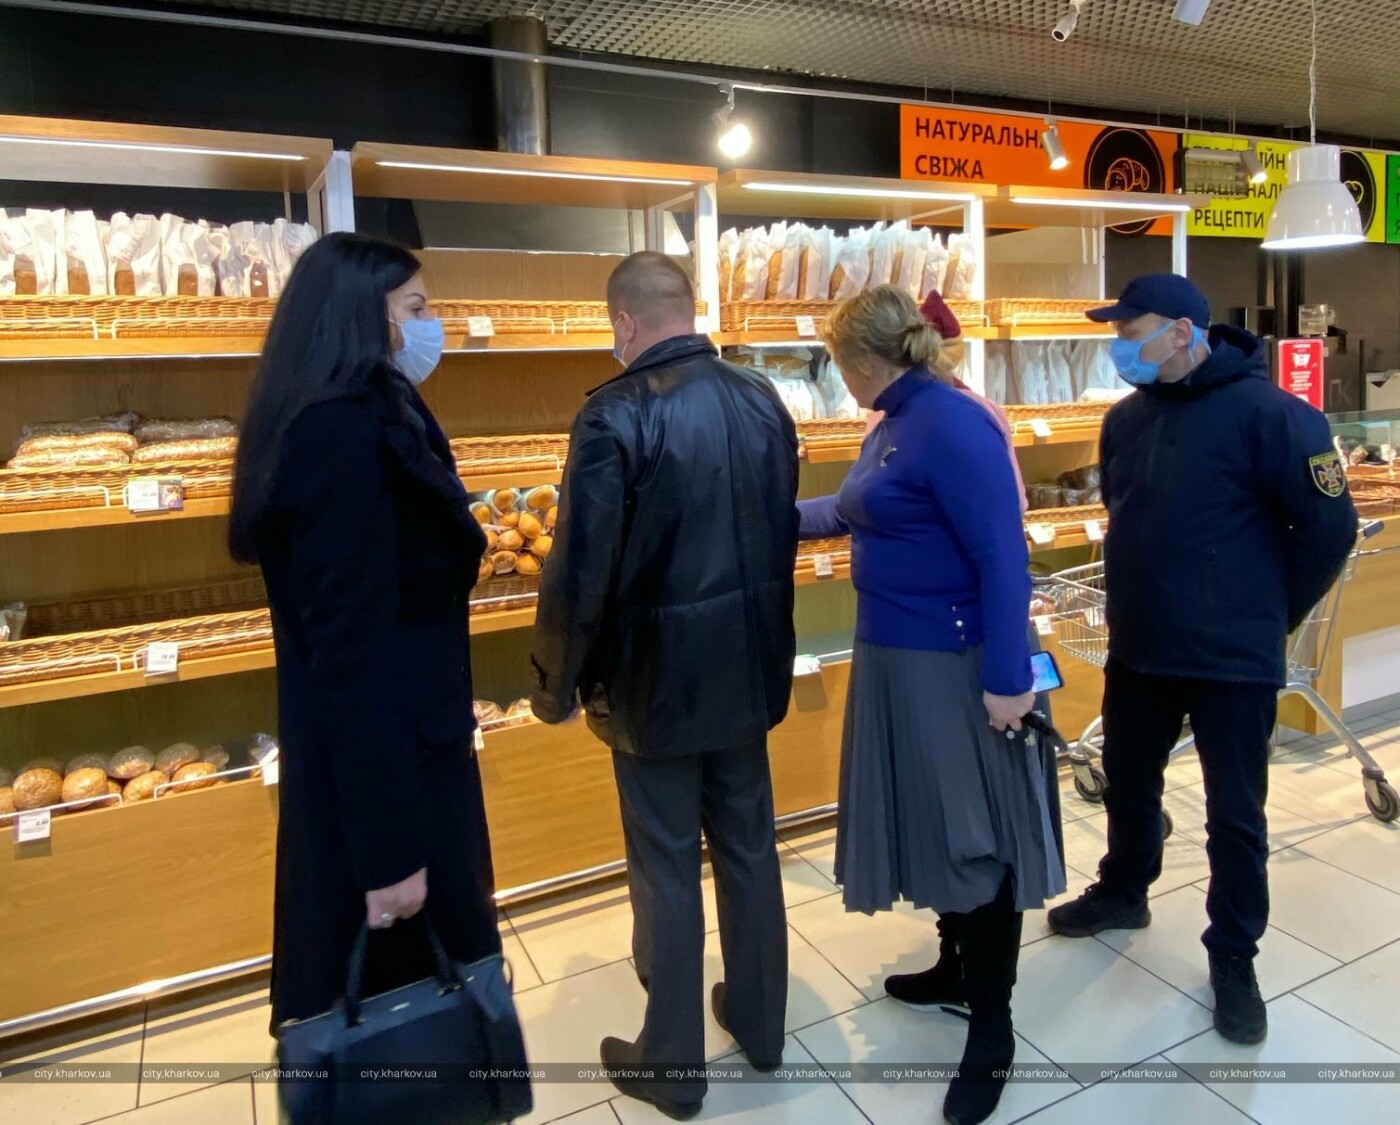 В Харькове проверили работу двух супермаркетов во время карантина, - ФОТО, фото-4